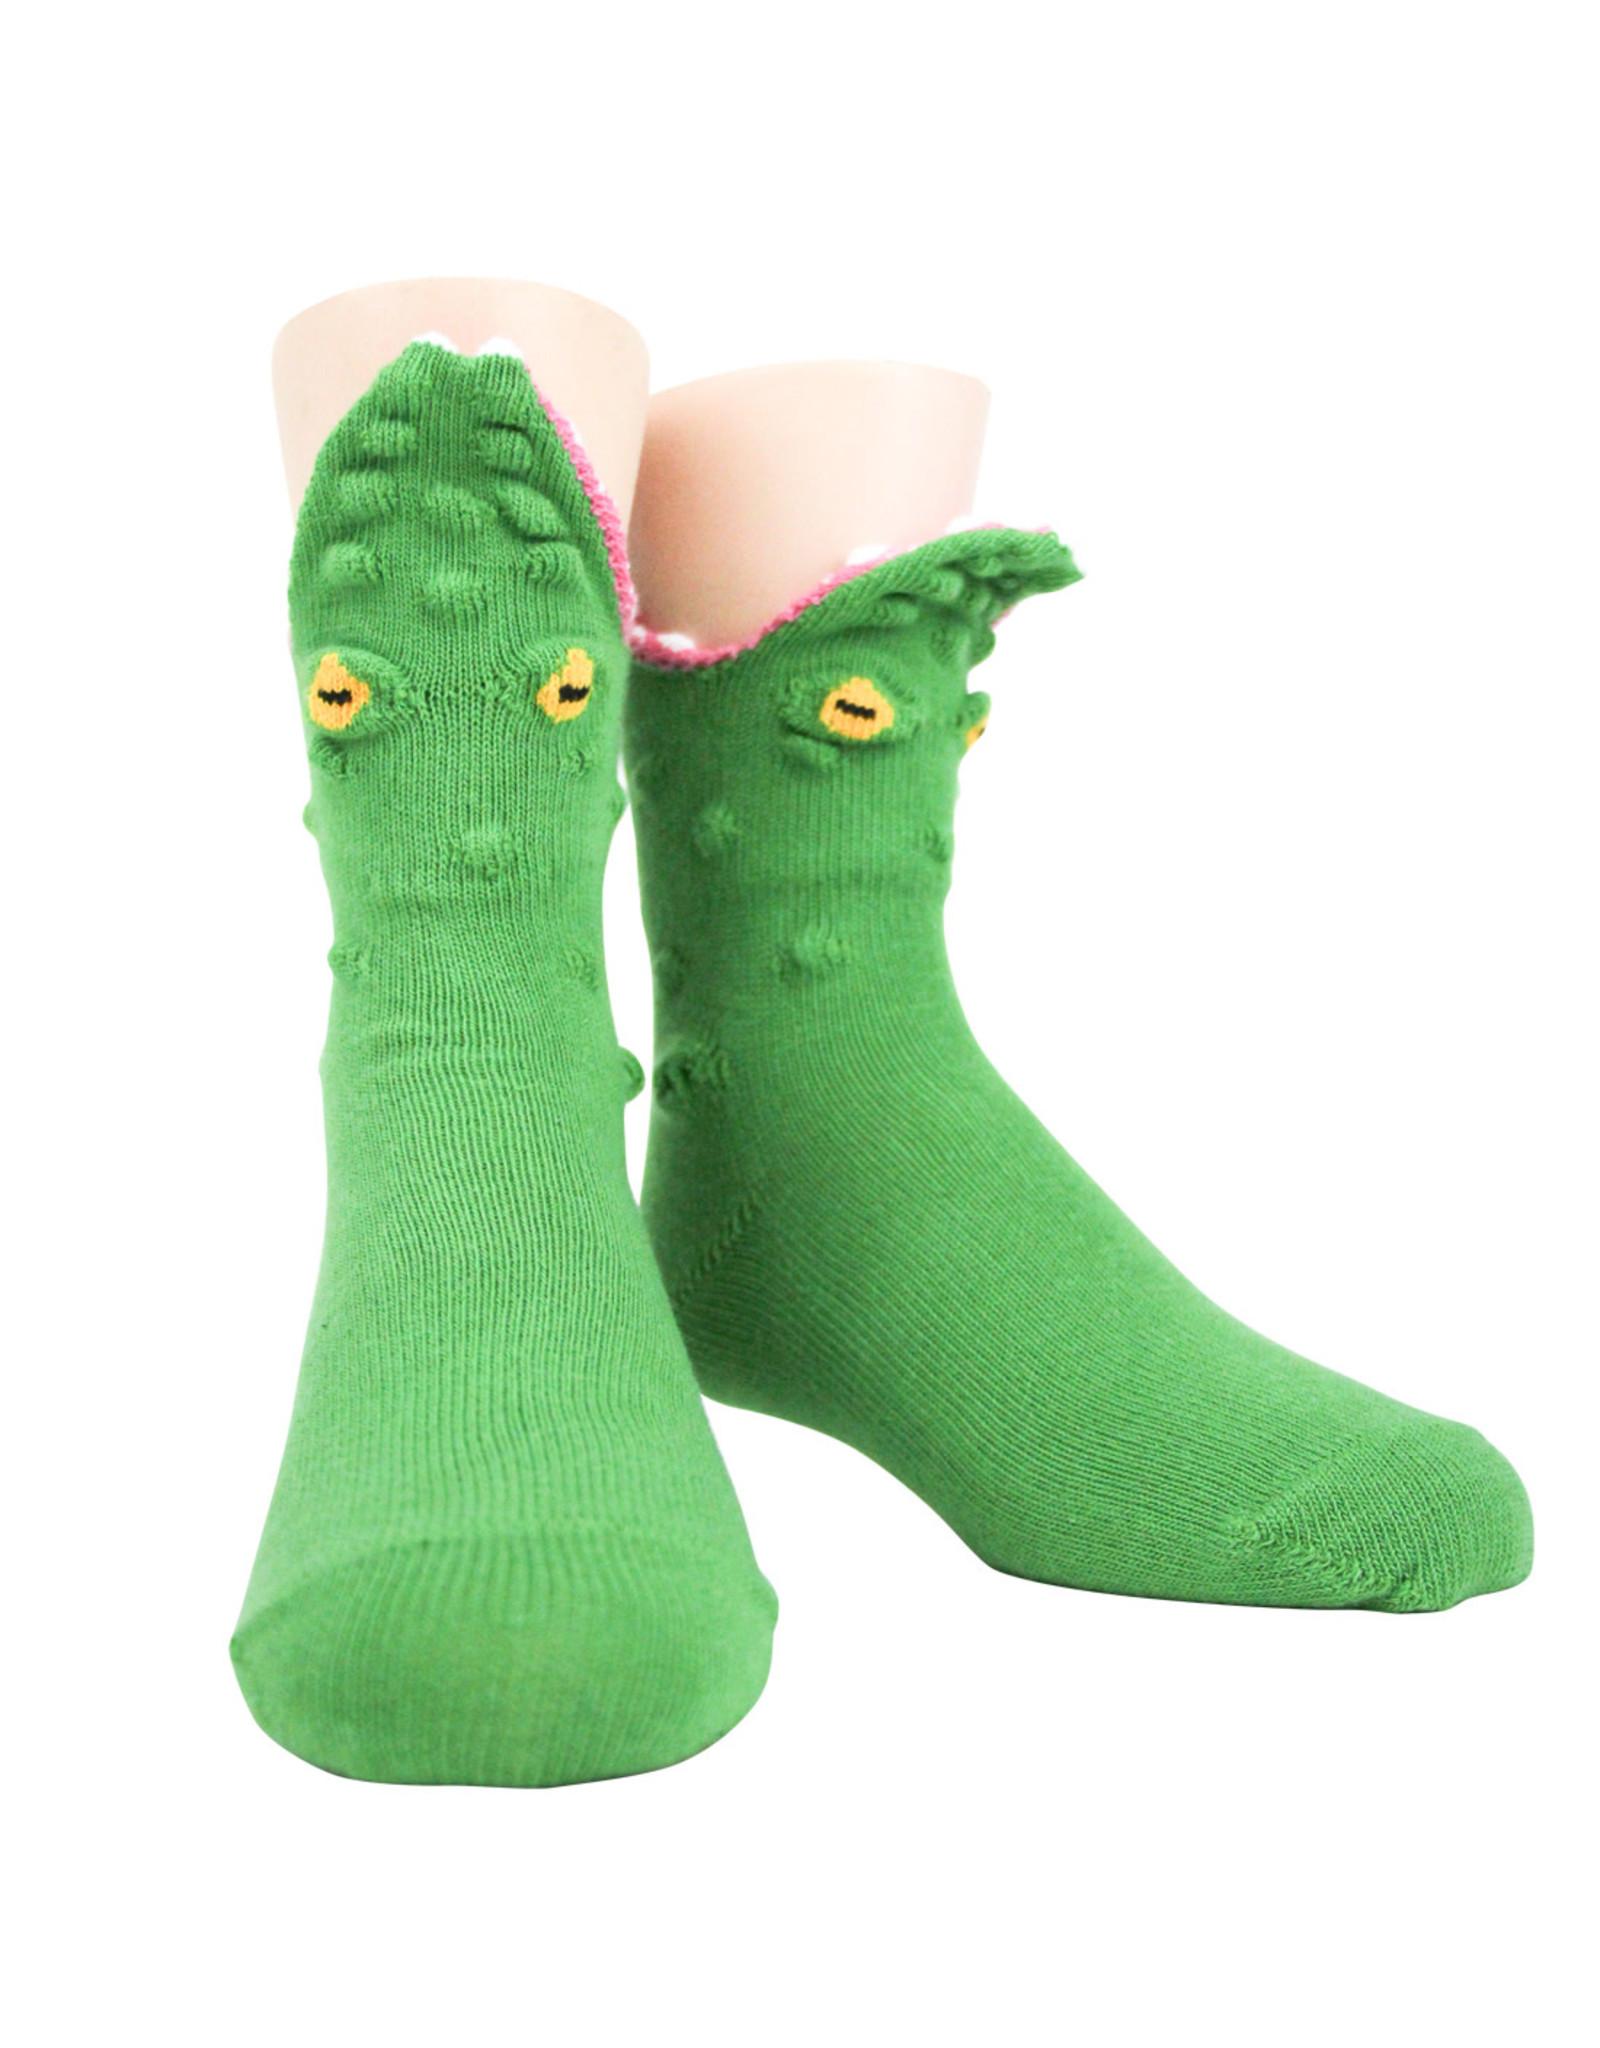 Socks (Kids) - 3D Alligator